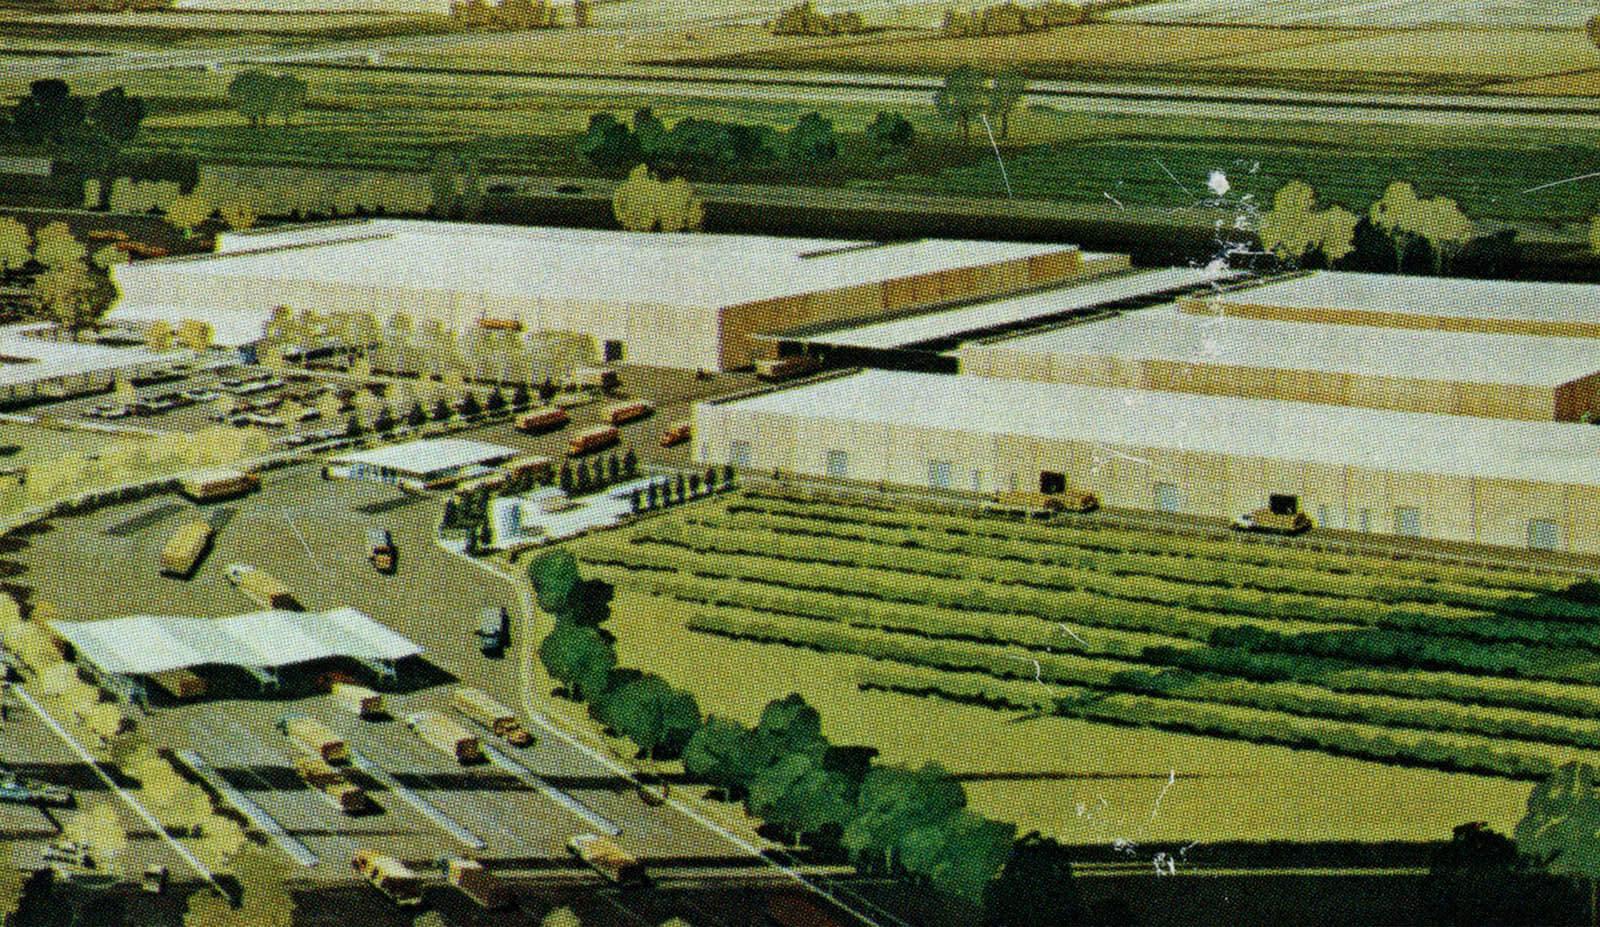 Sun-Maid's factory in Kingsburg, California